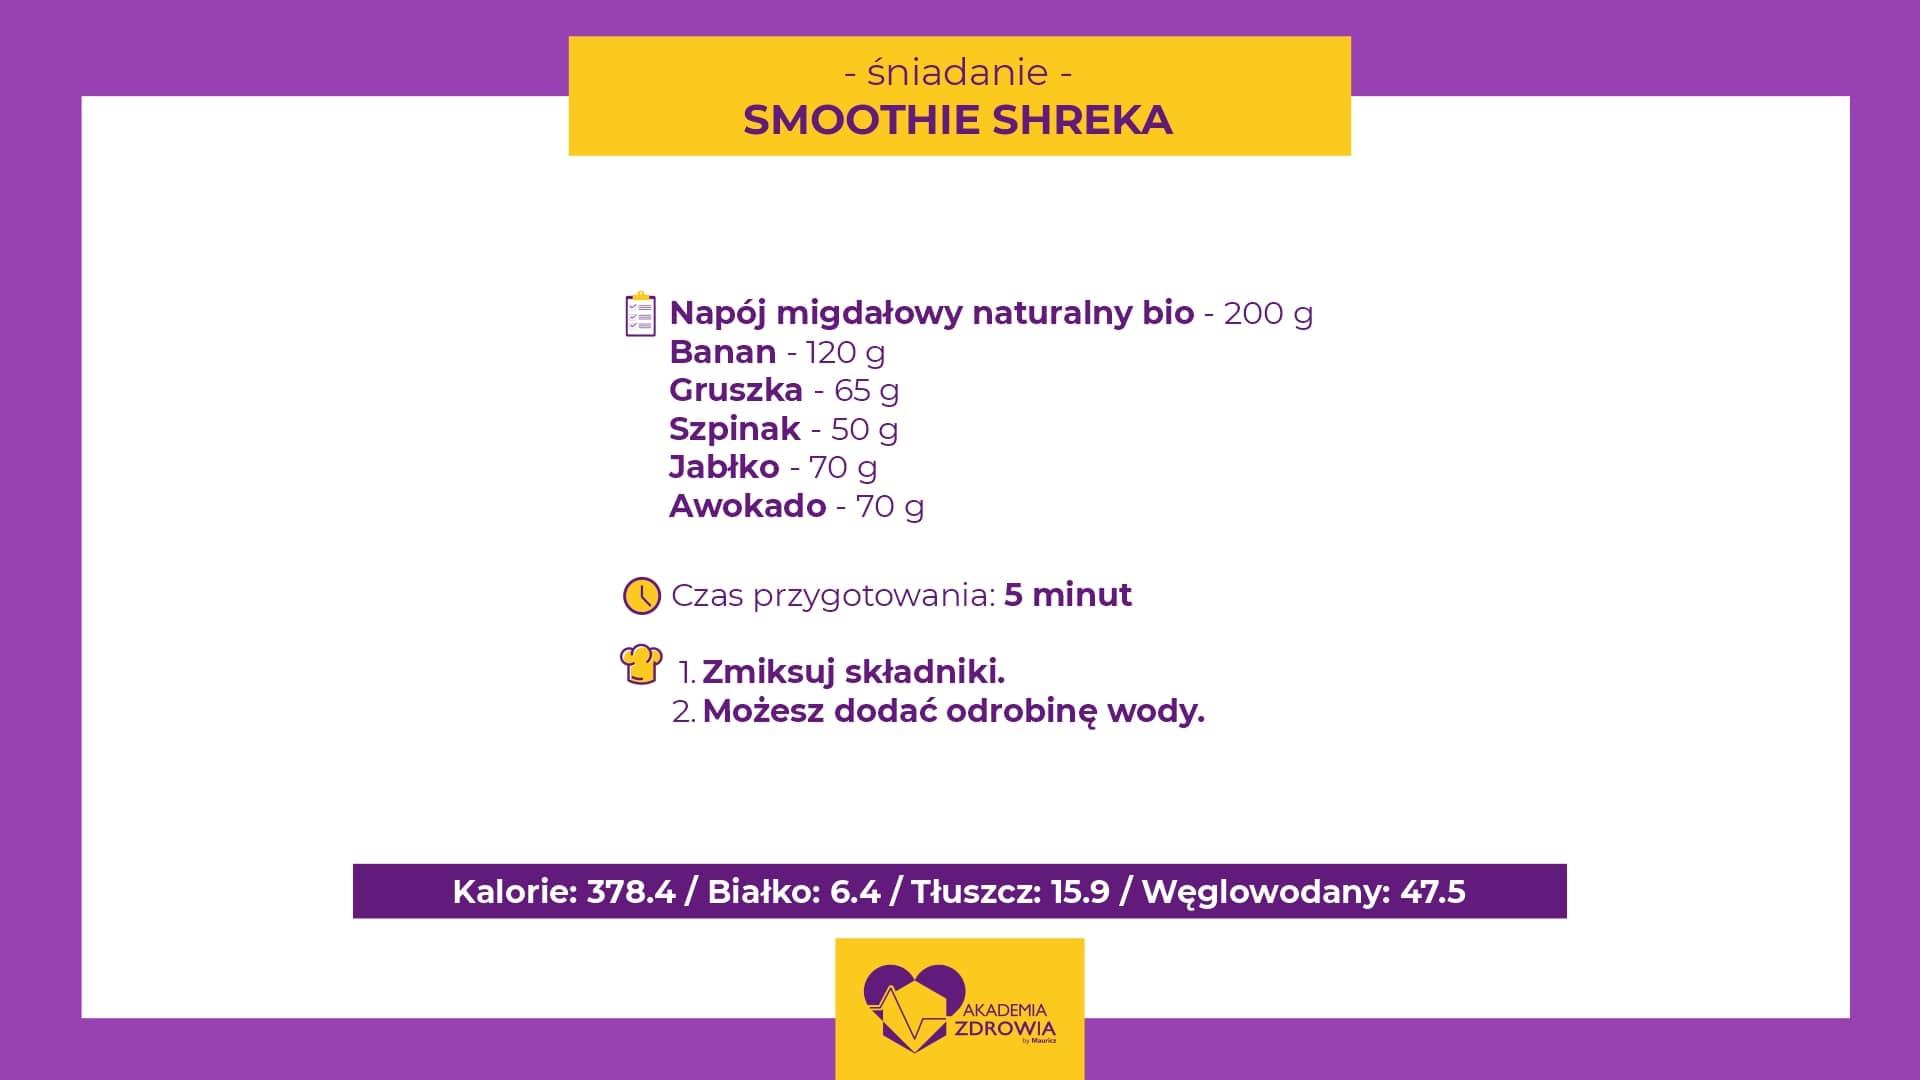 Smoothie Shreka